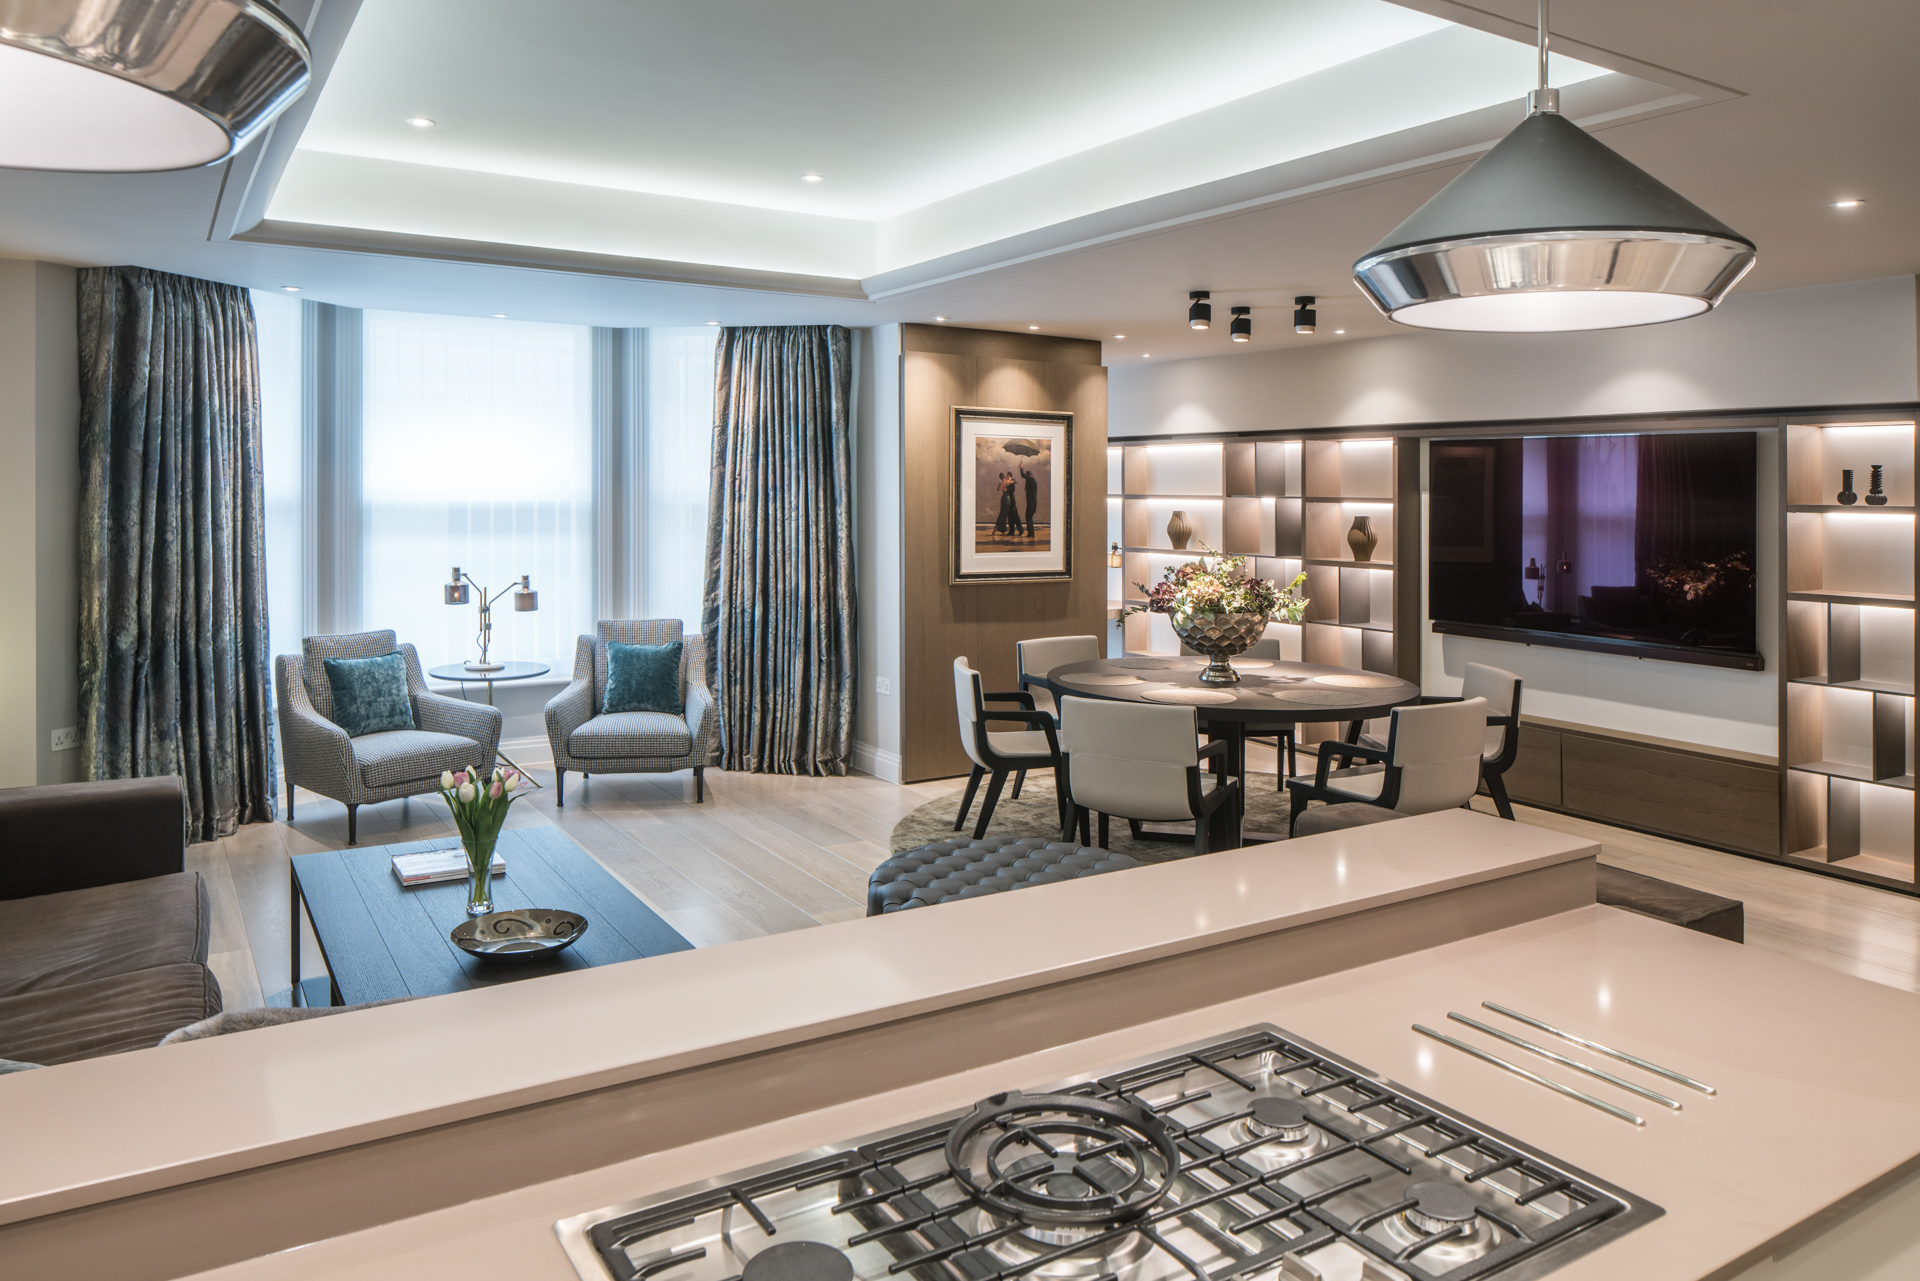 Residential interior design kensington apartment in london for Residential interior designers london